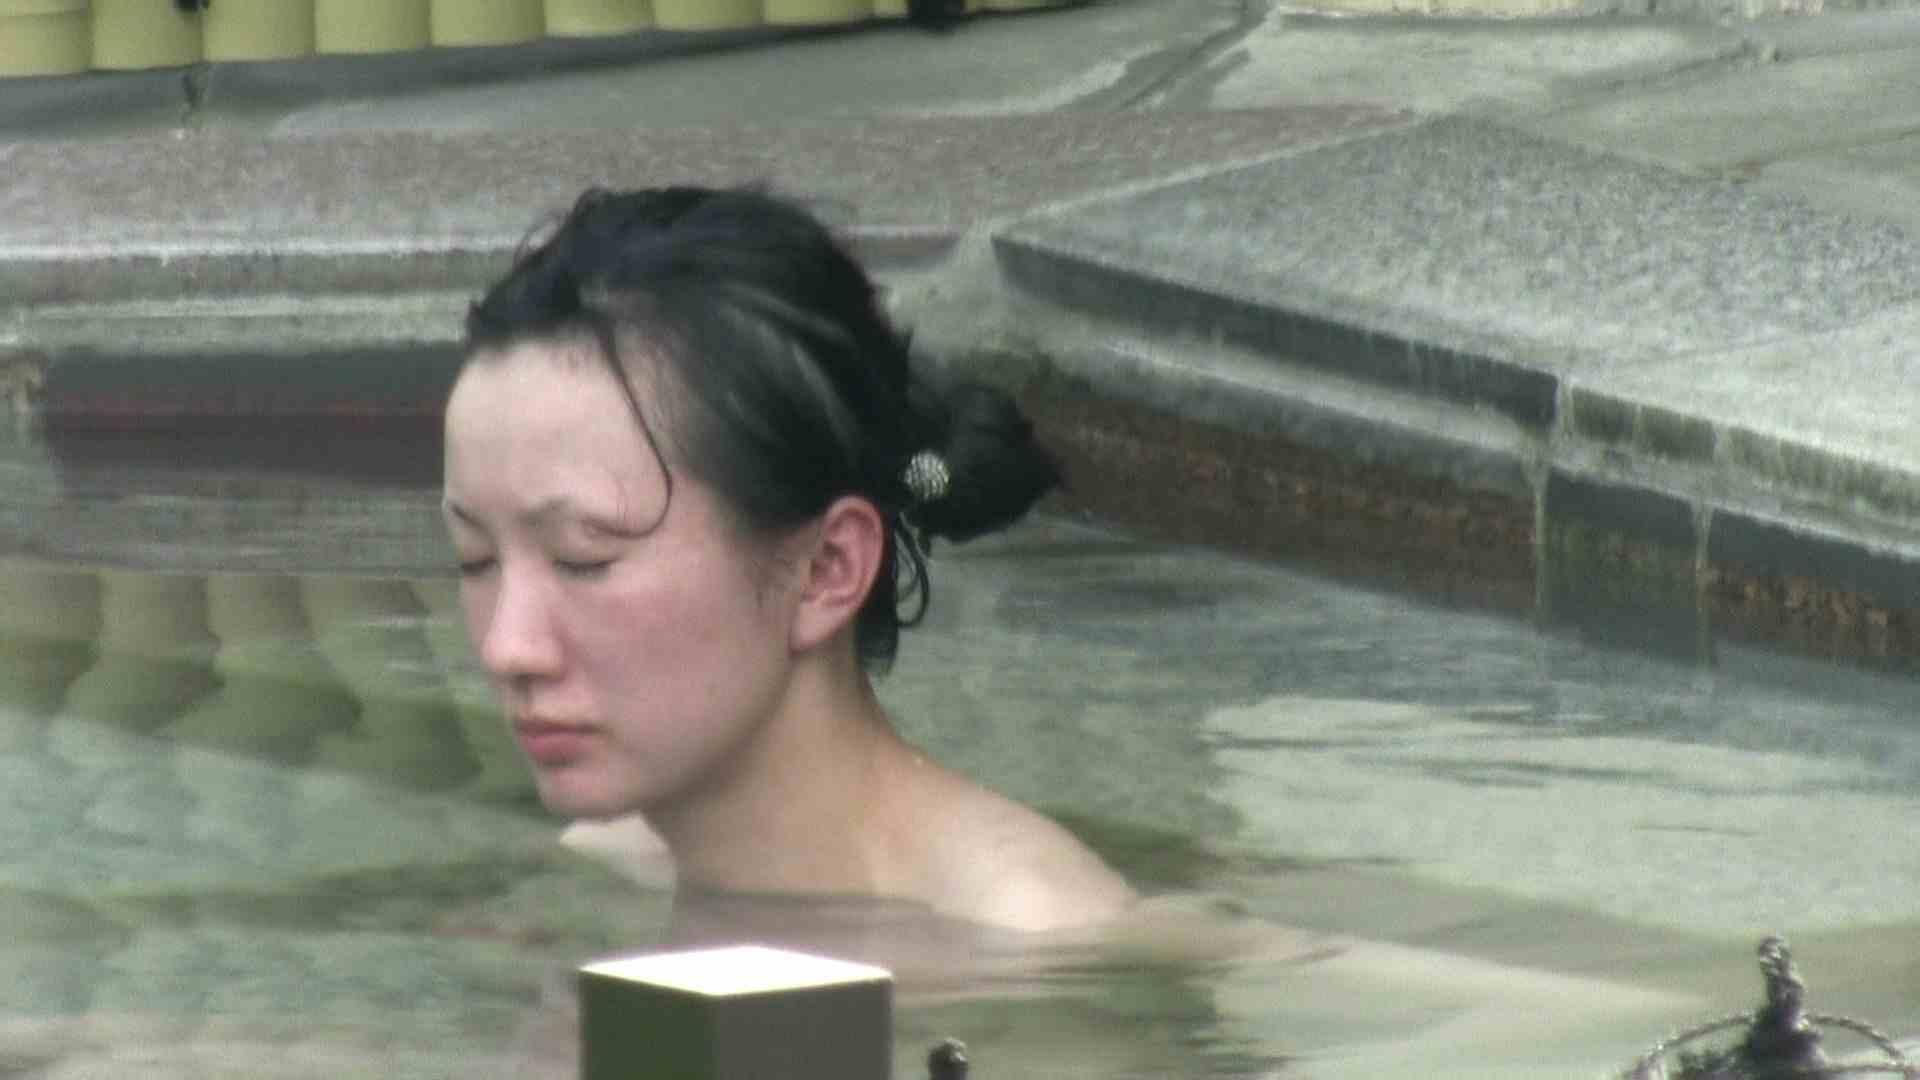 Aquaな露天風呂Vol.663 0  20連発 6